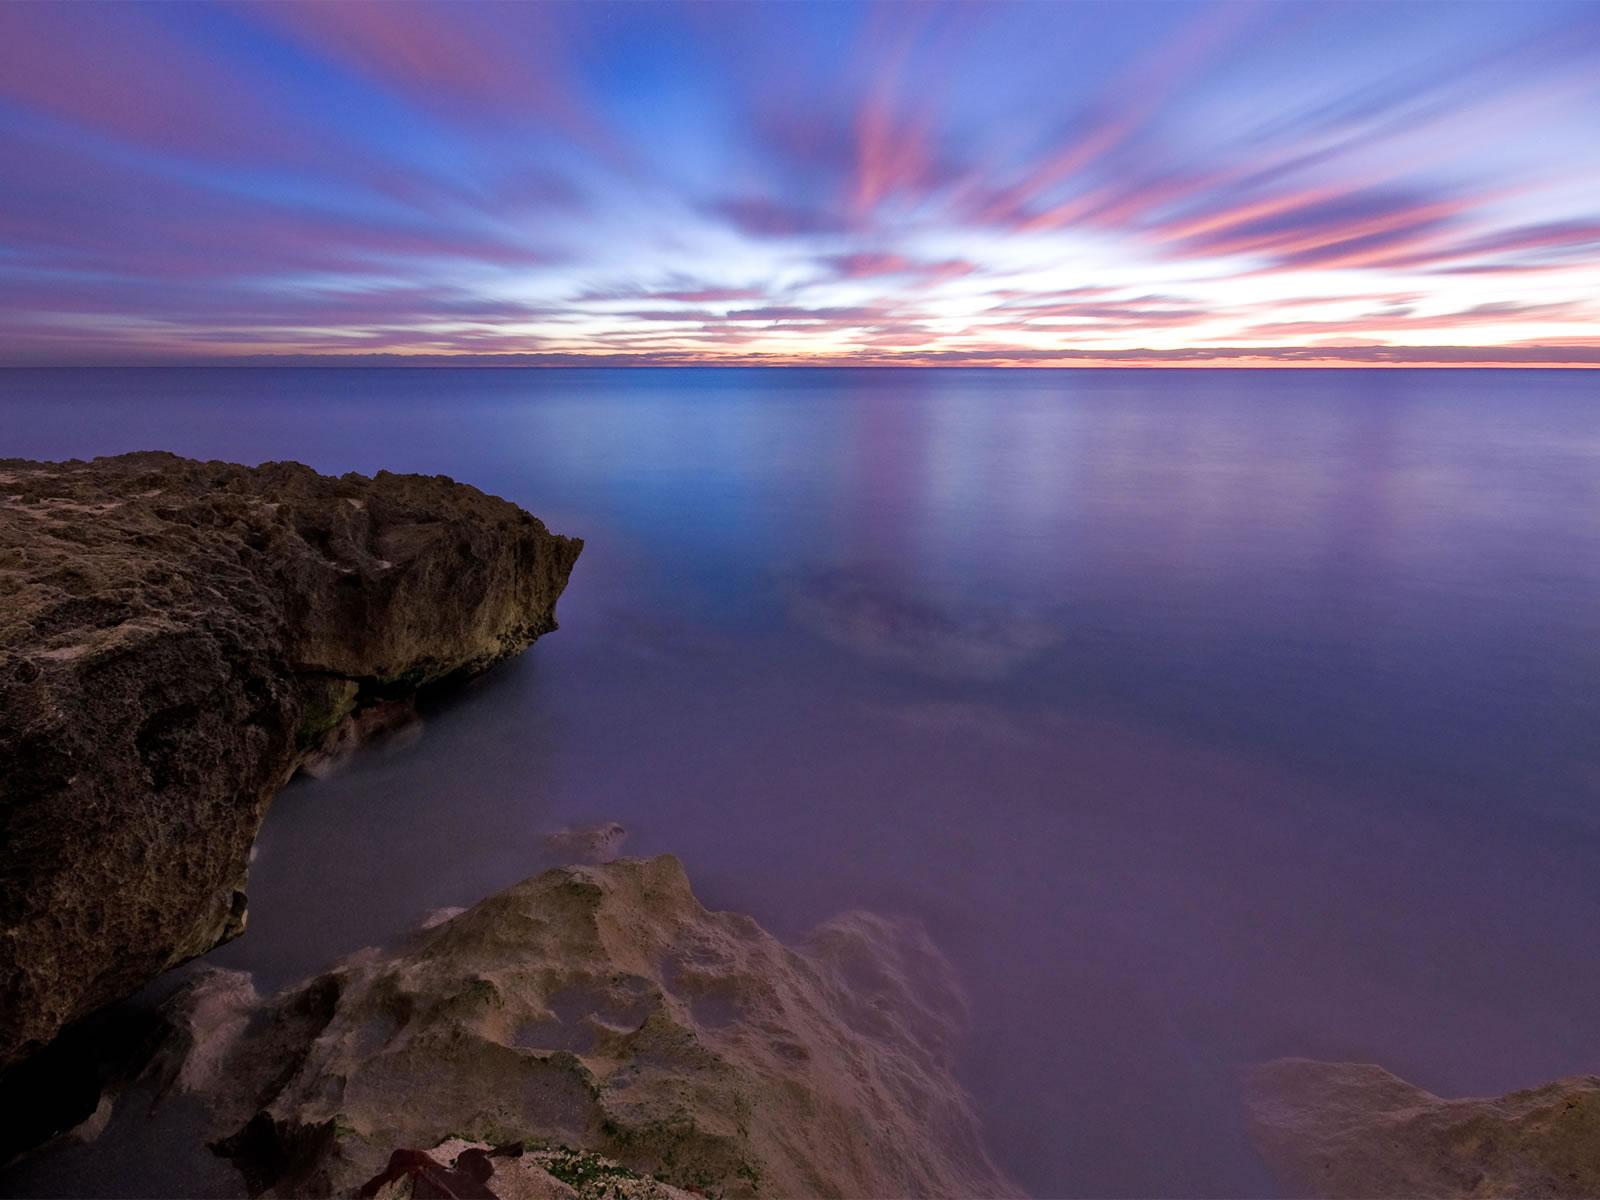 scene wallpapers dream scene win 7 dream scene wmv 9 50 ocean waves at ...